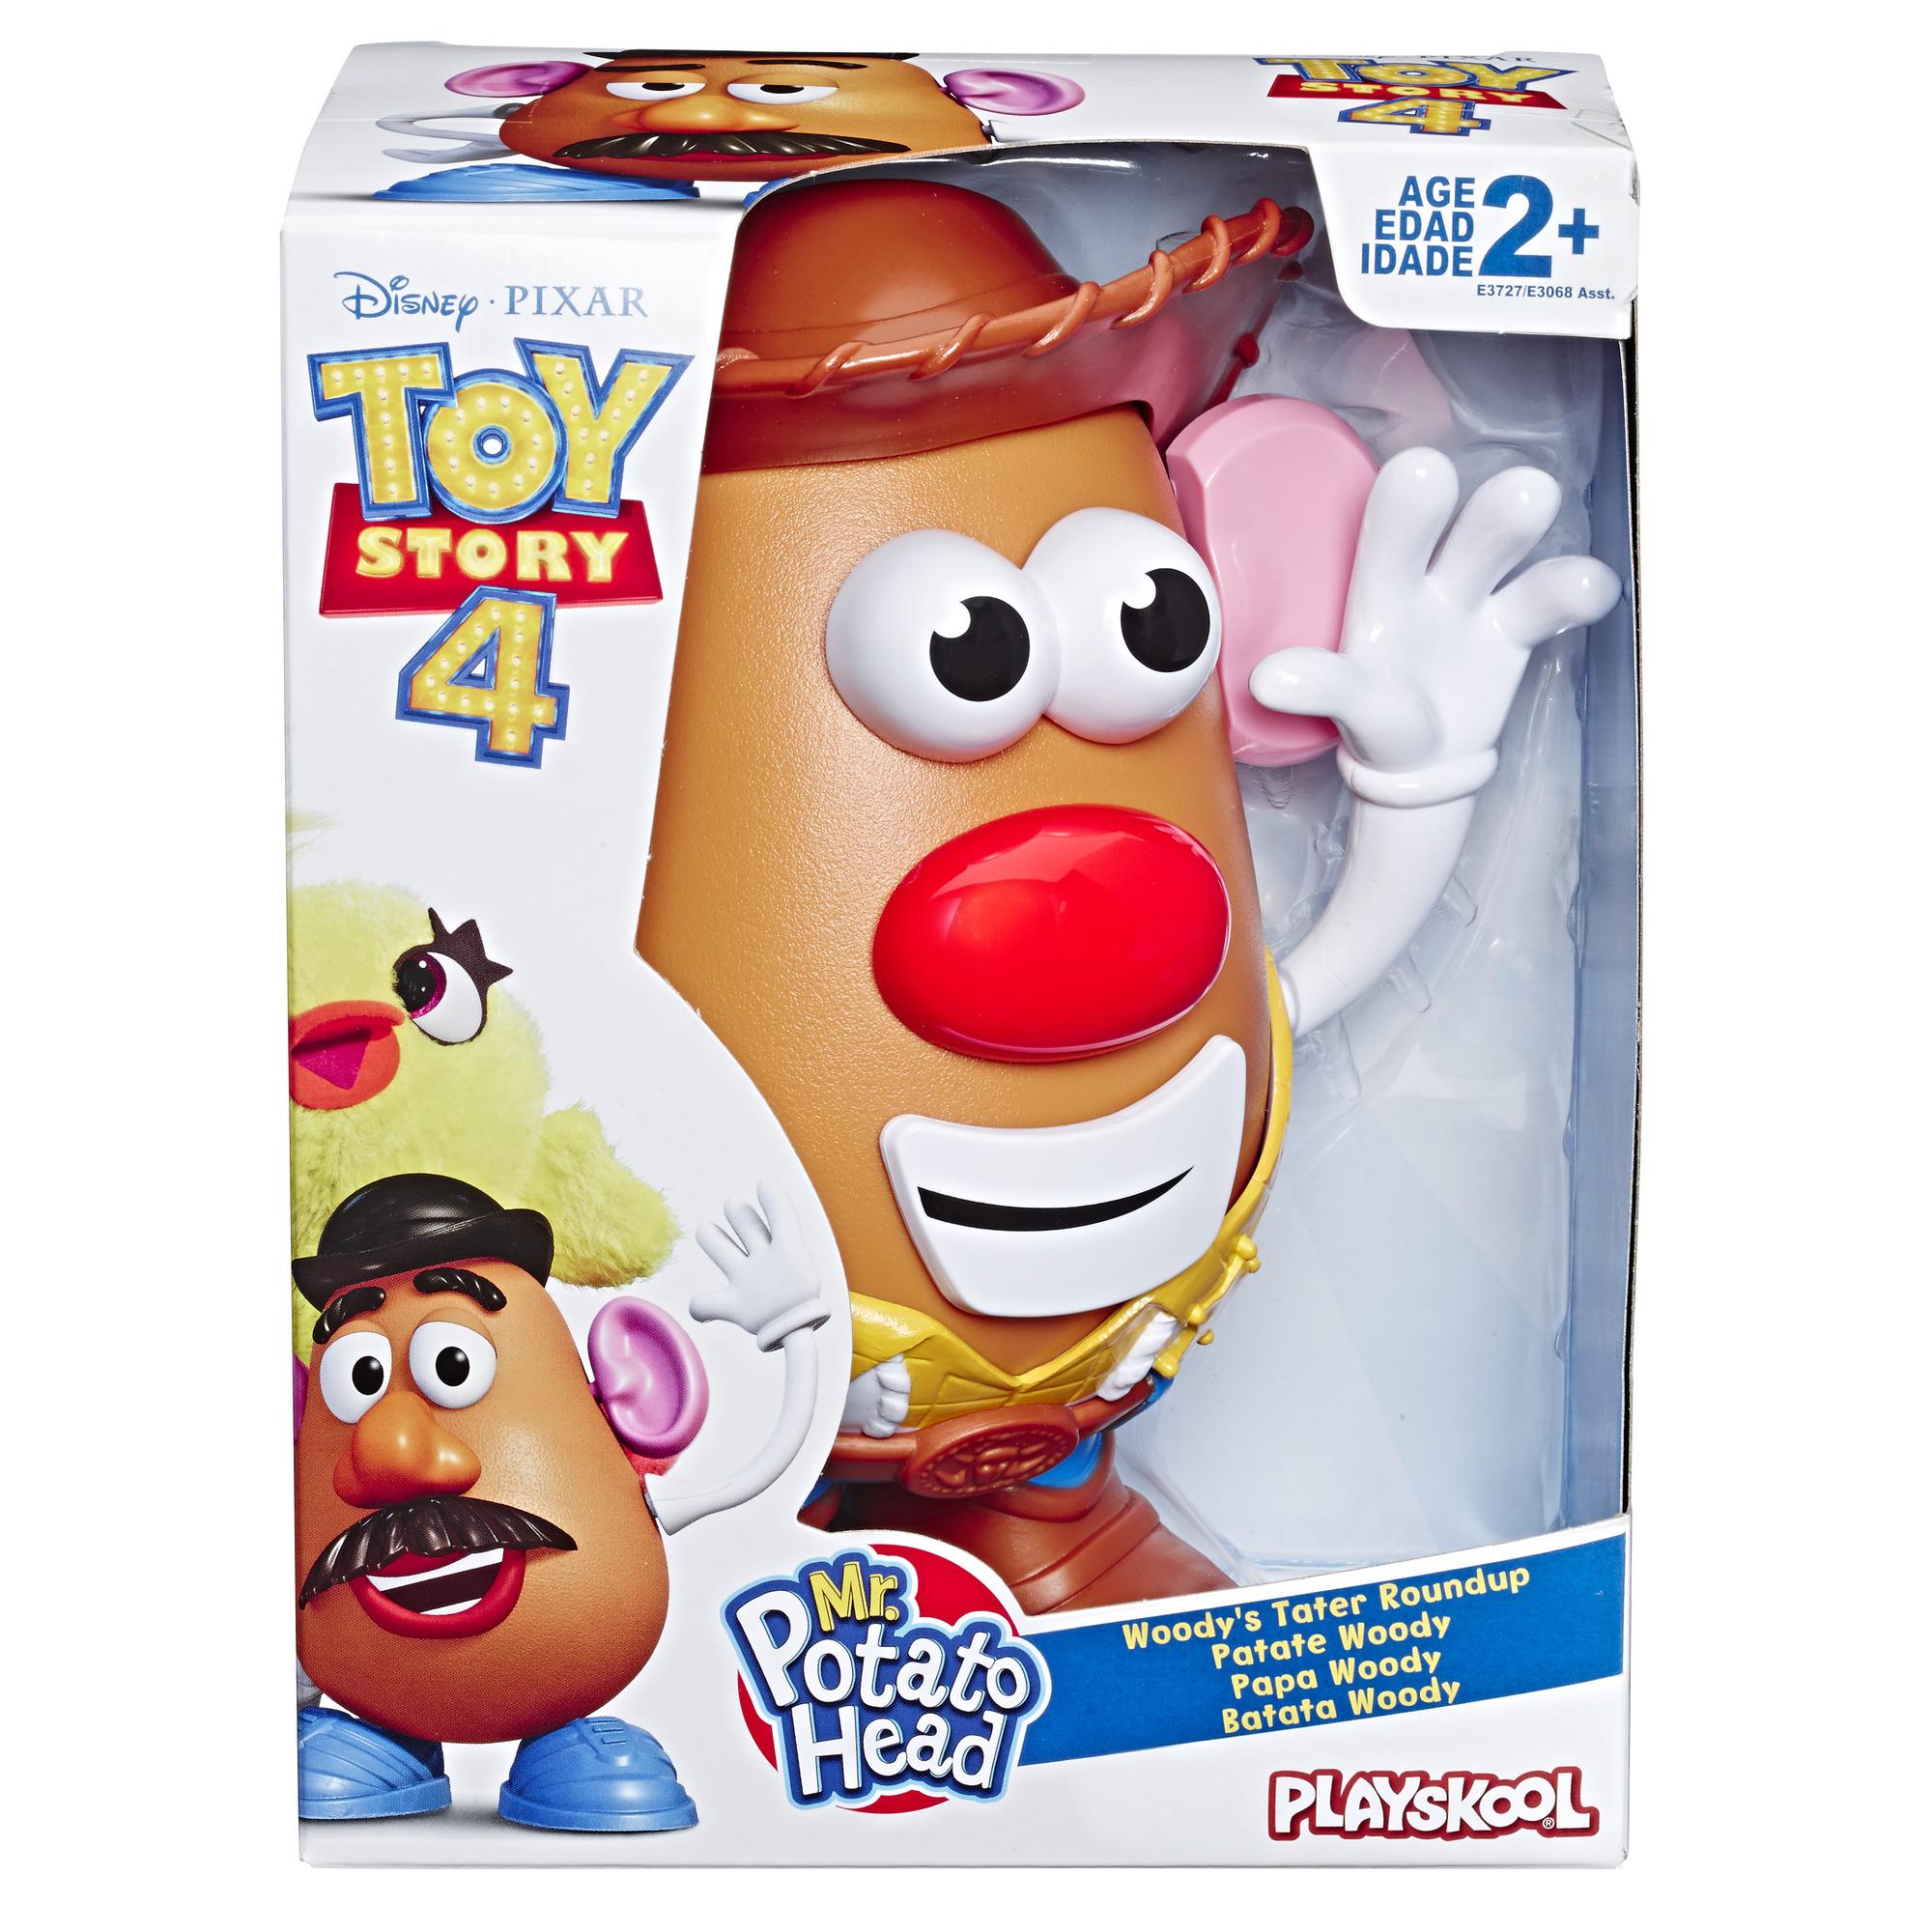 Mr Potato Head Disney Pixar Toy Story 4 Woody S Tater Roundup Figure 630509747139 Ebay